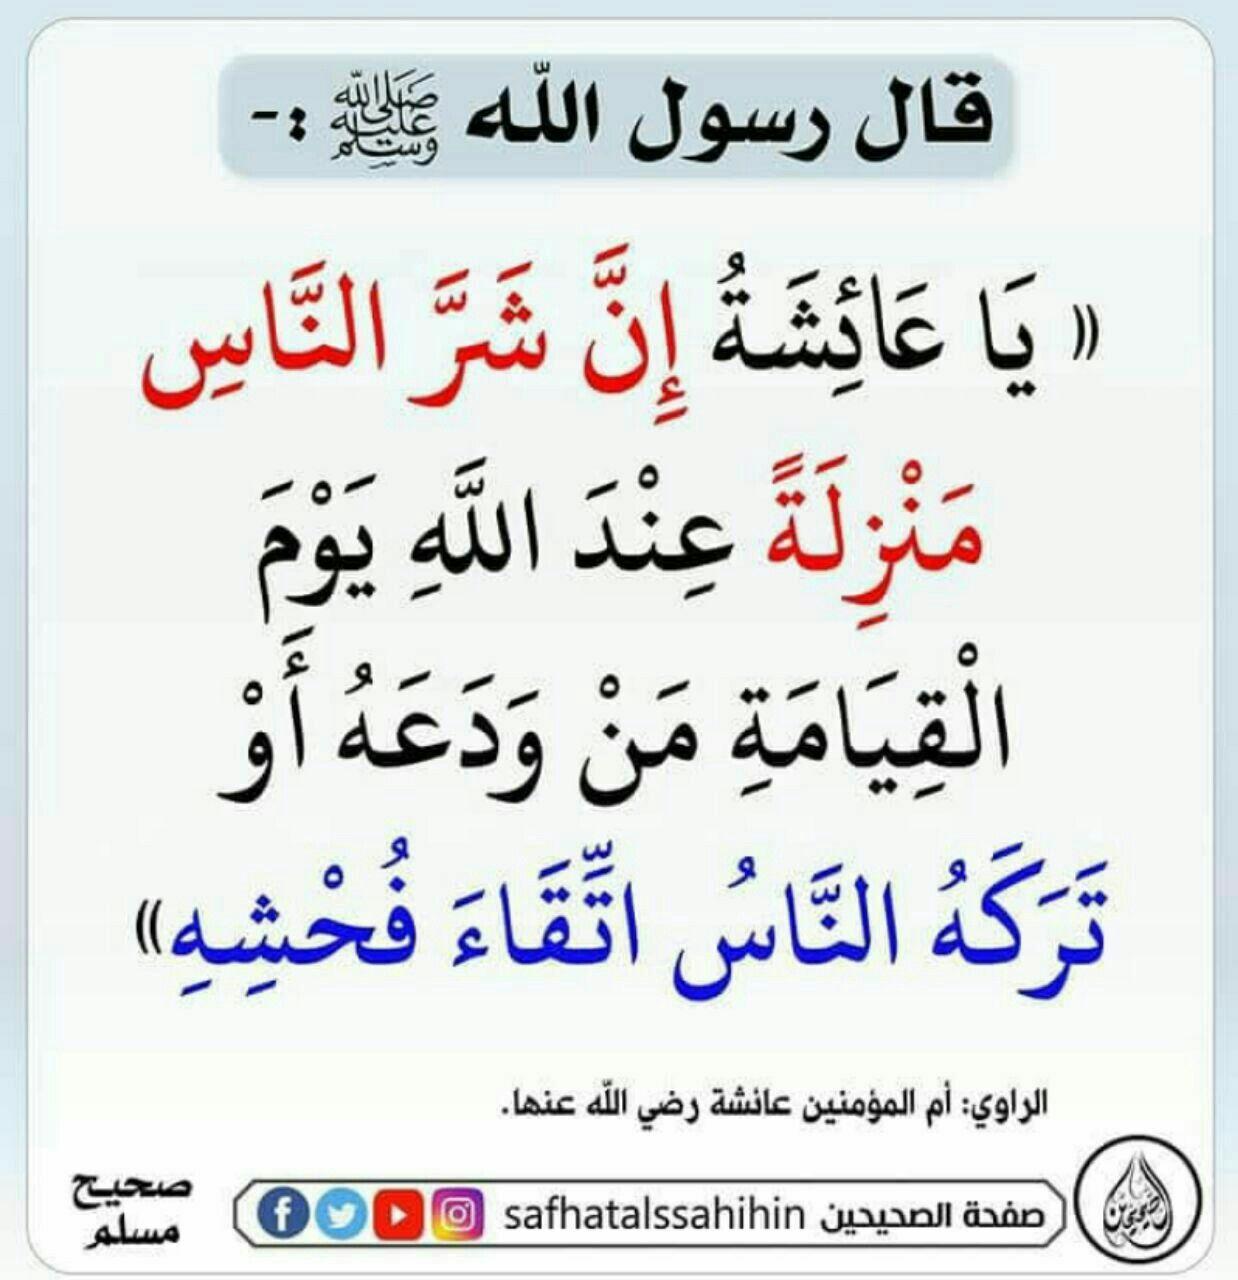 Pin By زهرة الياسمين On الأحاديث النبوية Islamic Phrases Islamic Quotes Words Quotes